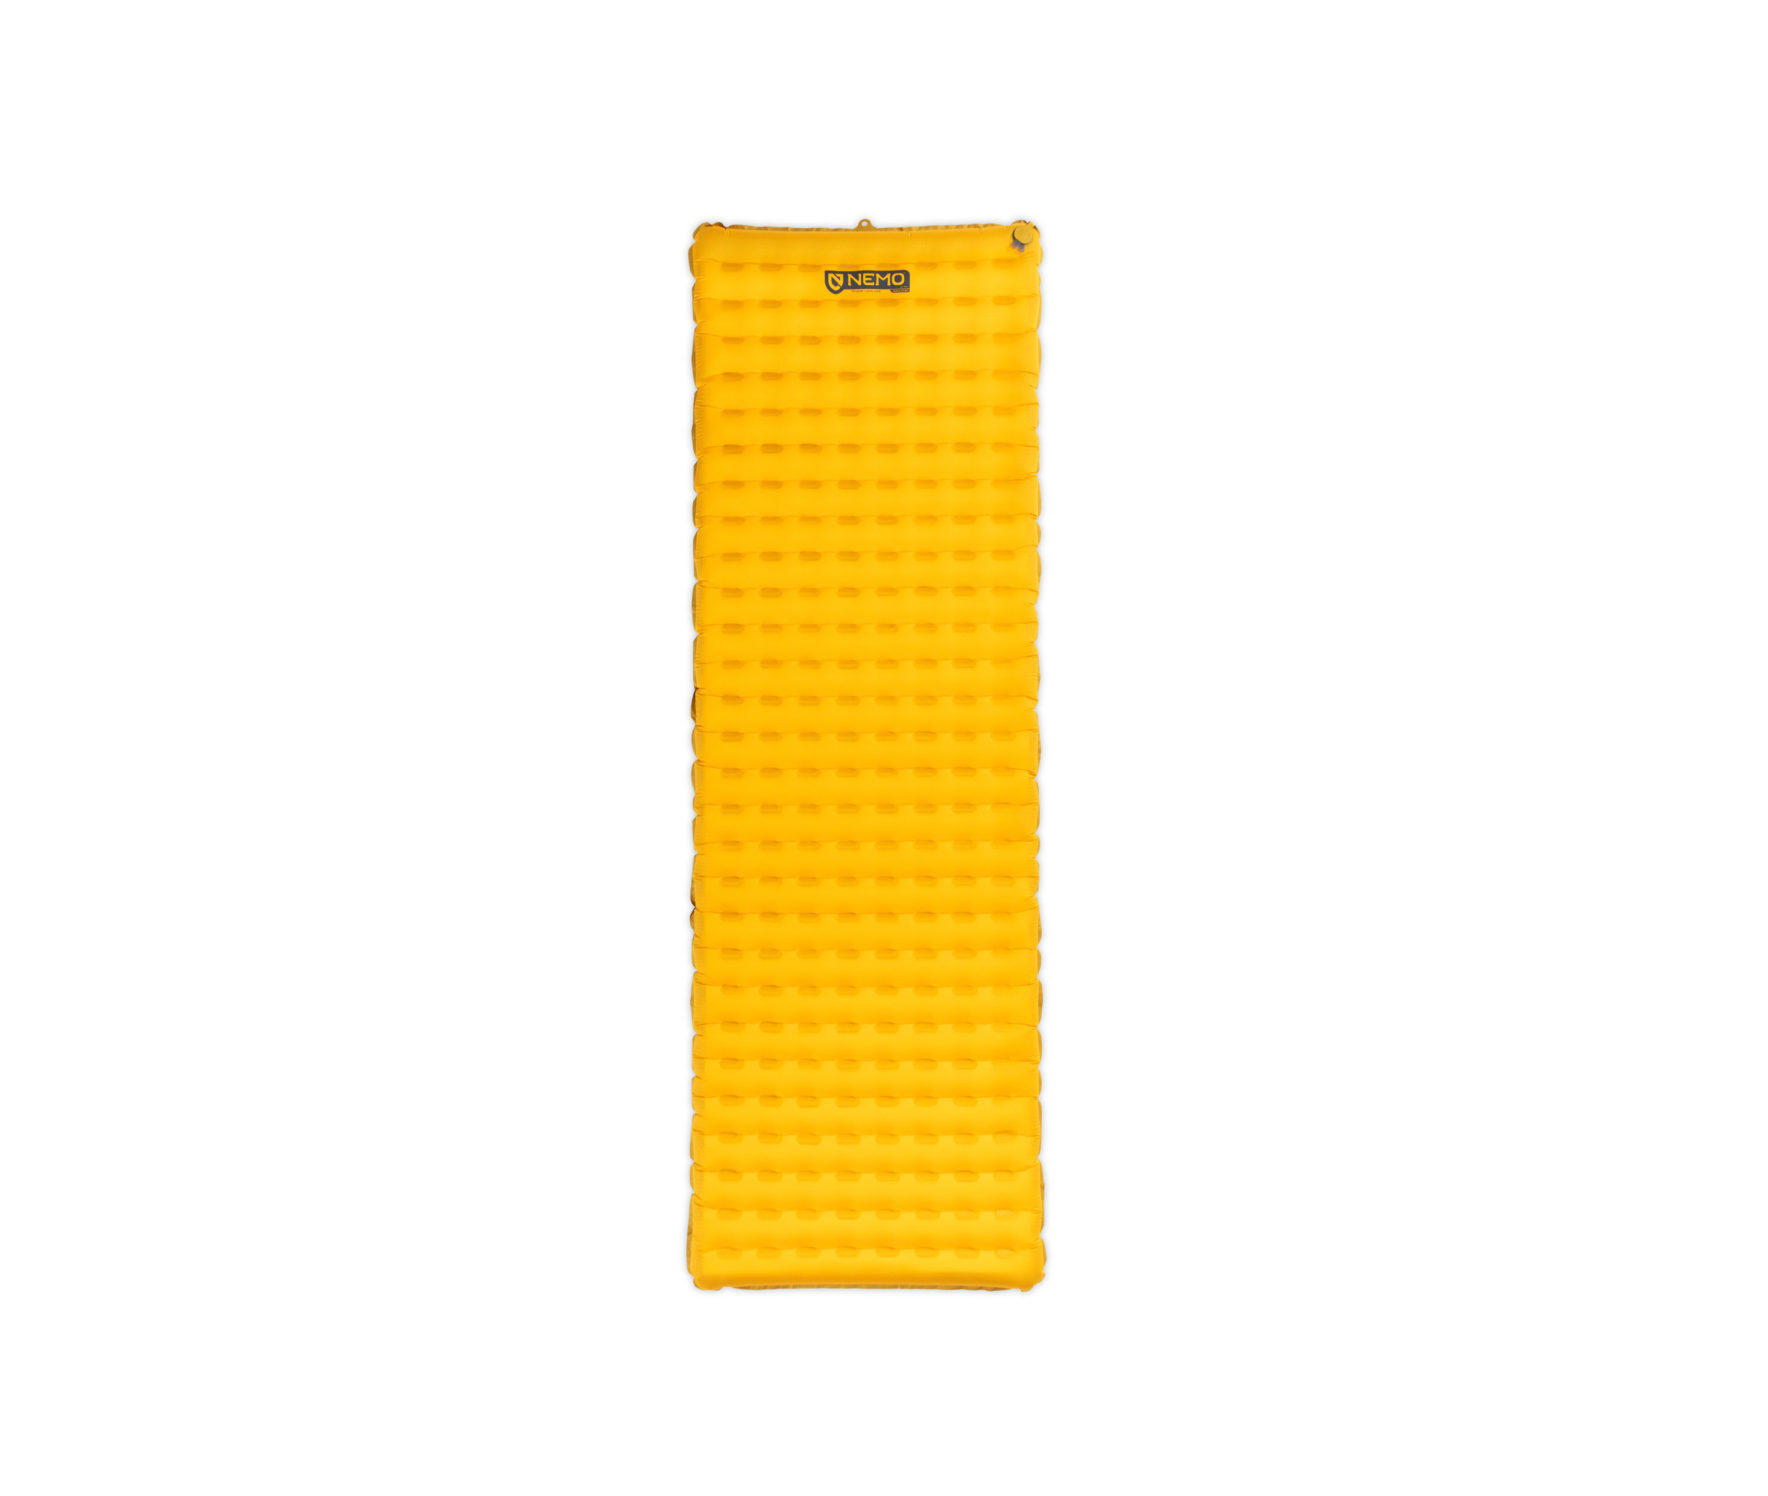 Nemo Tensor Insulated - Sleeping pad